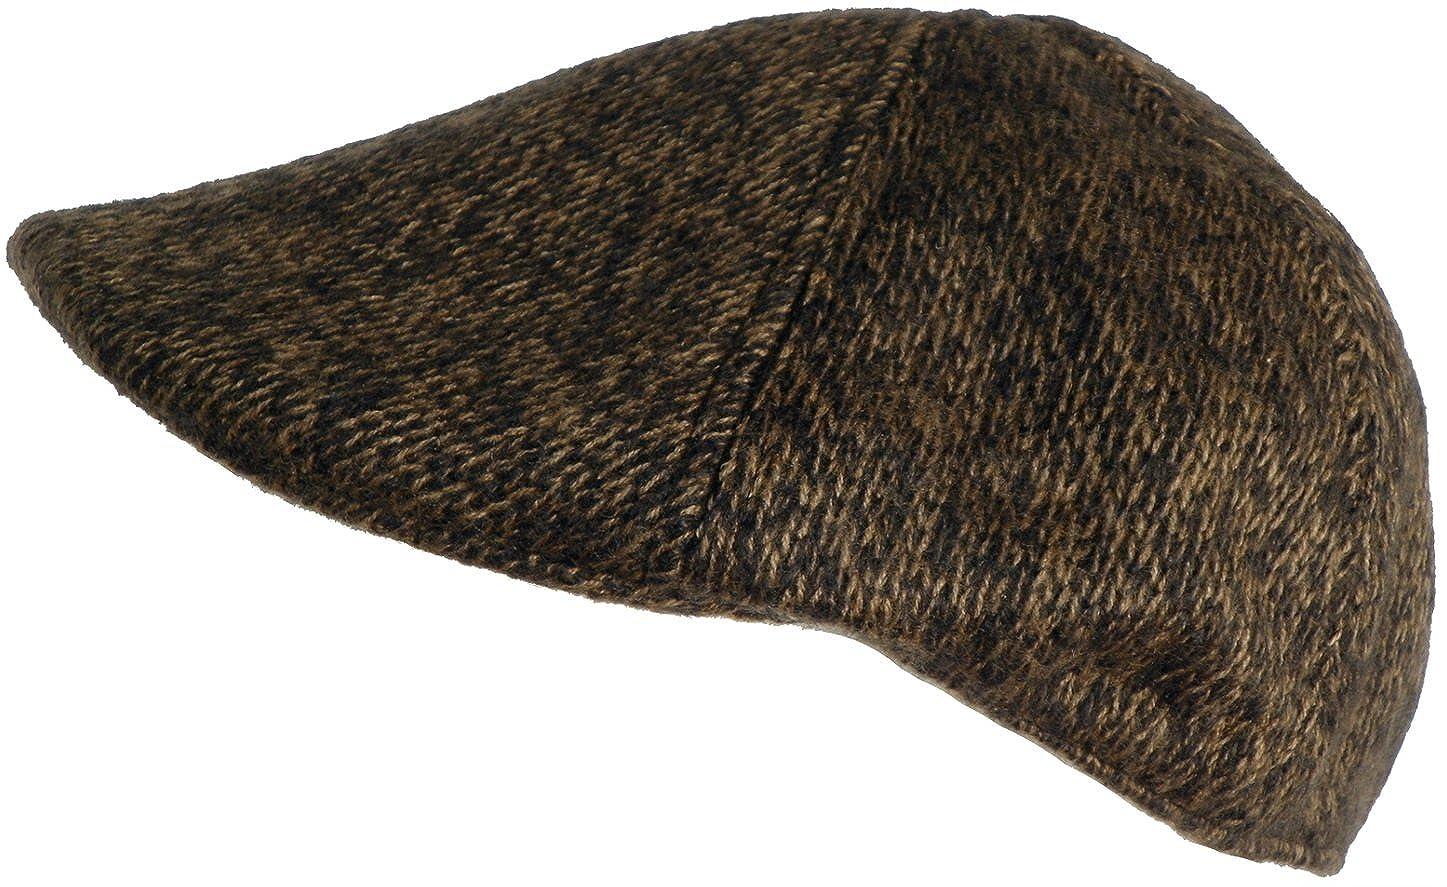 Geoffrey Beene Knit Ivy Scally Cap 6 Panel Duck Bill Driving Hat